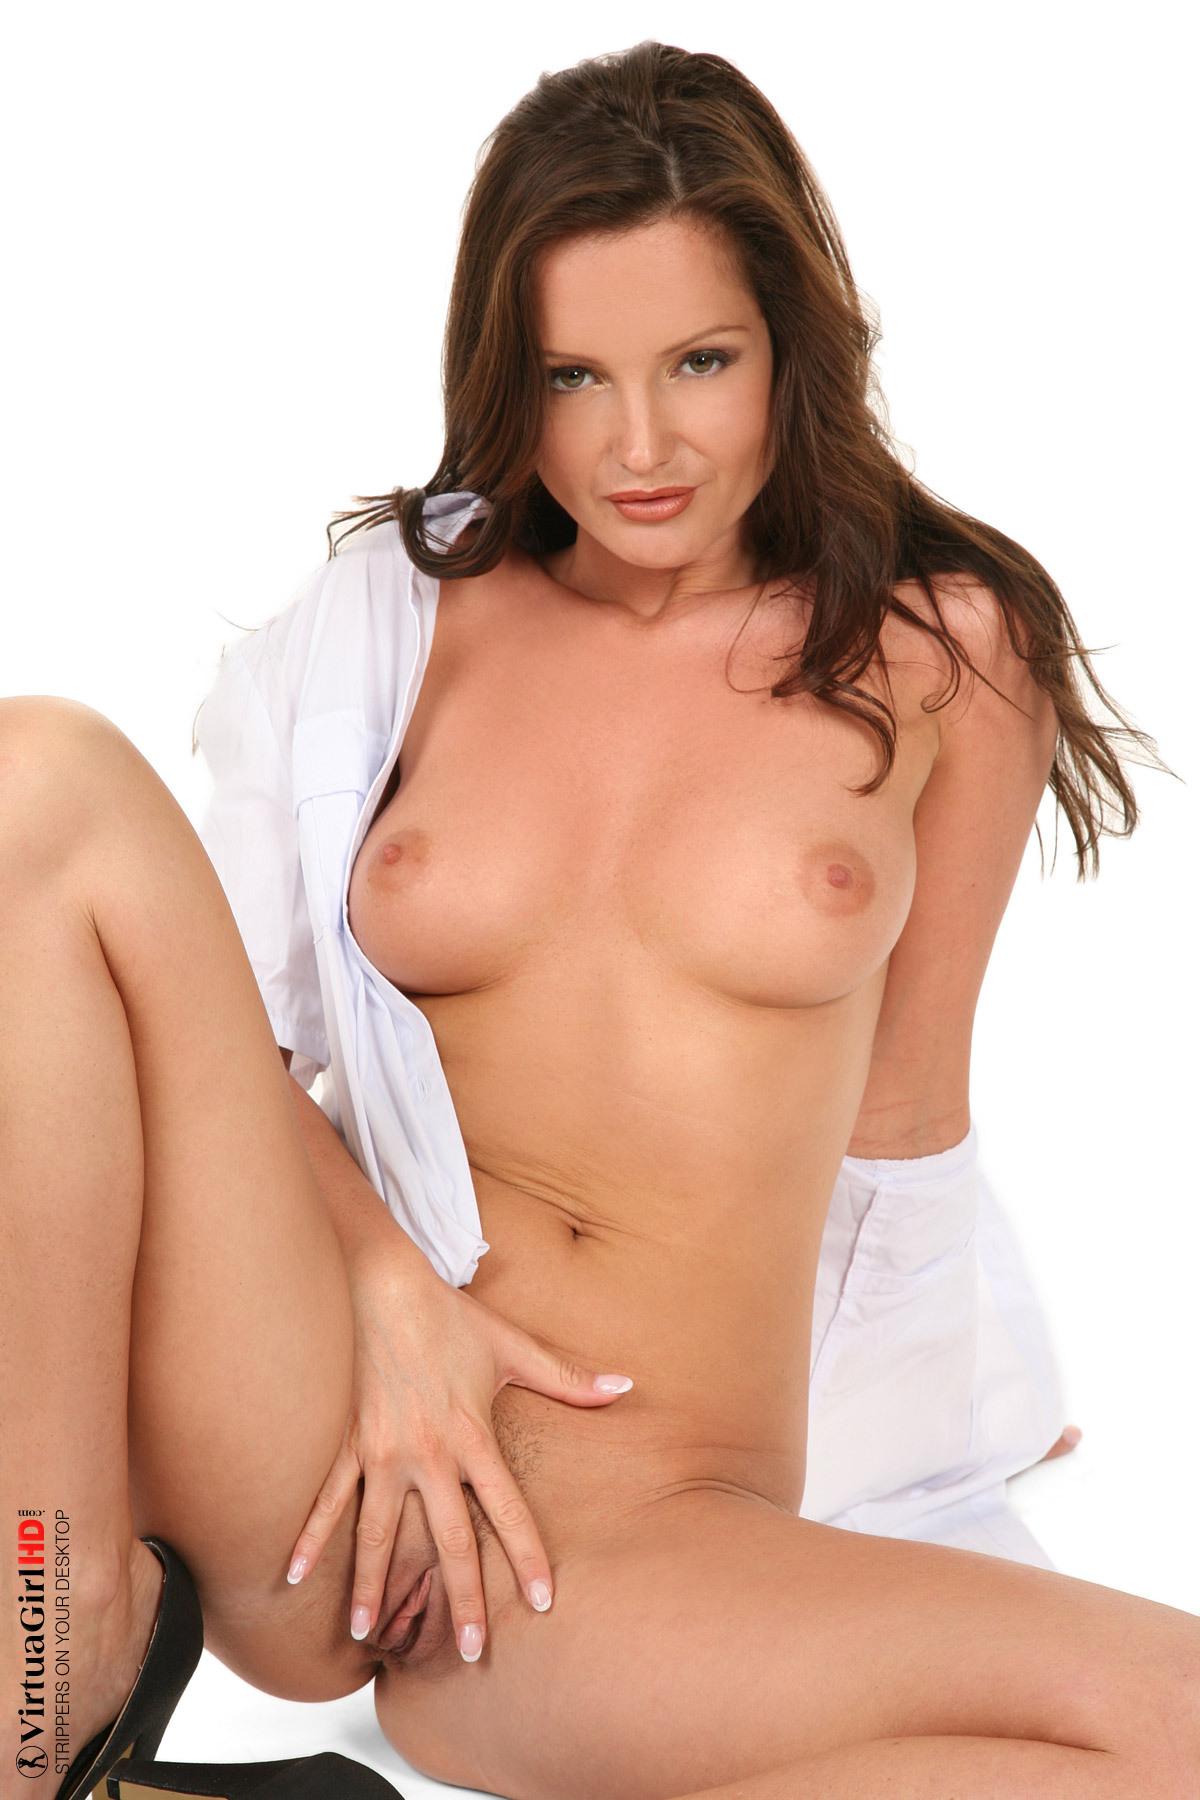 hot girls stripping pornhub